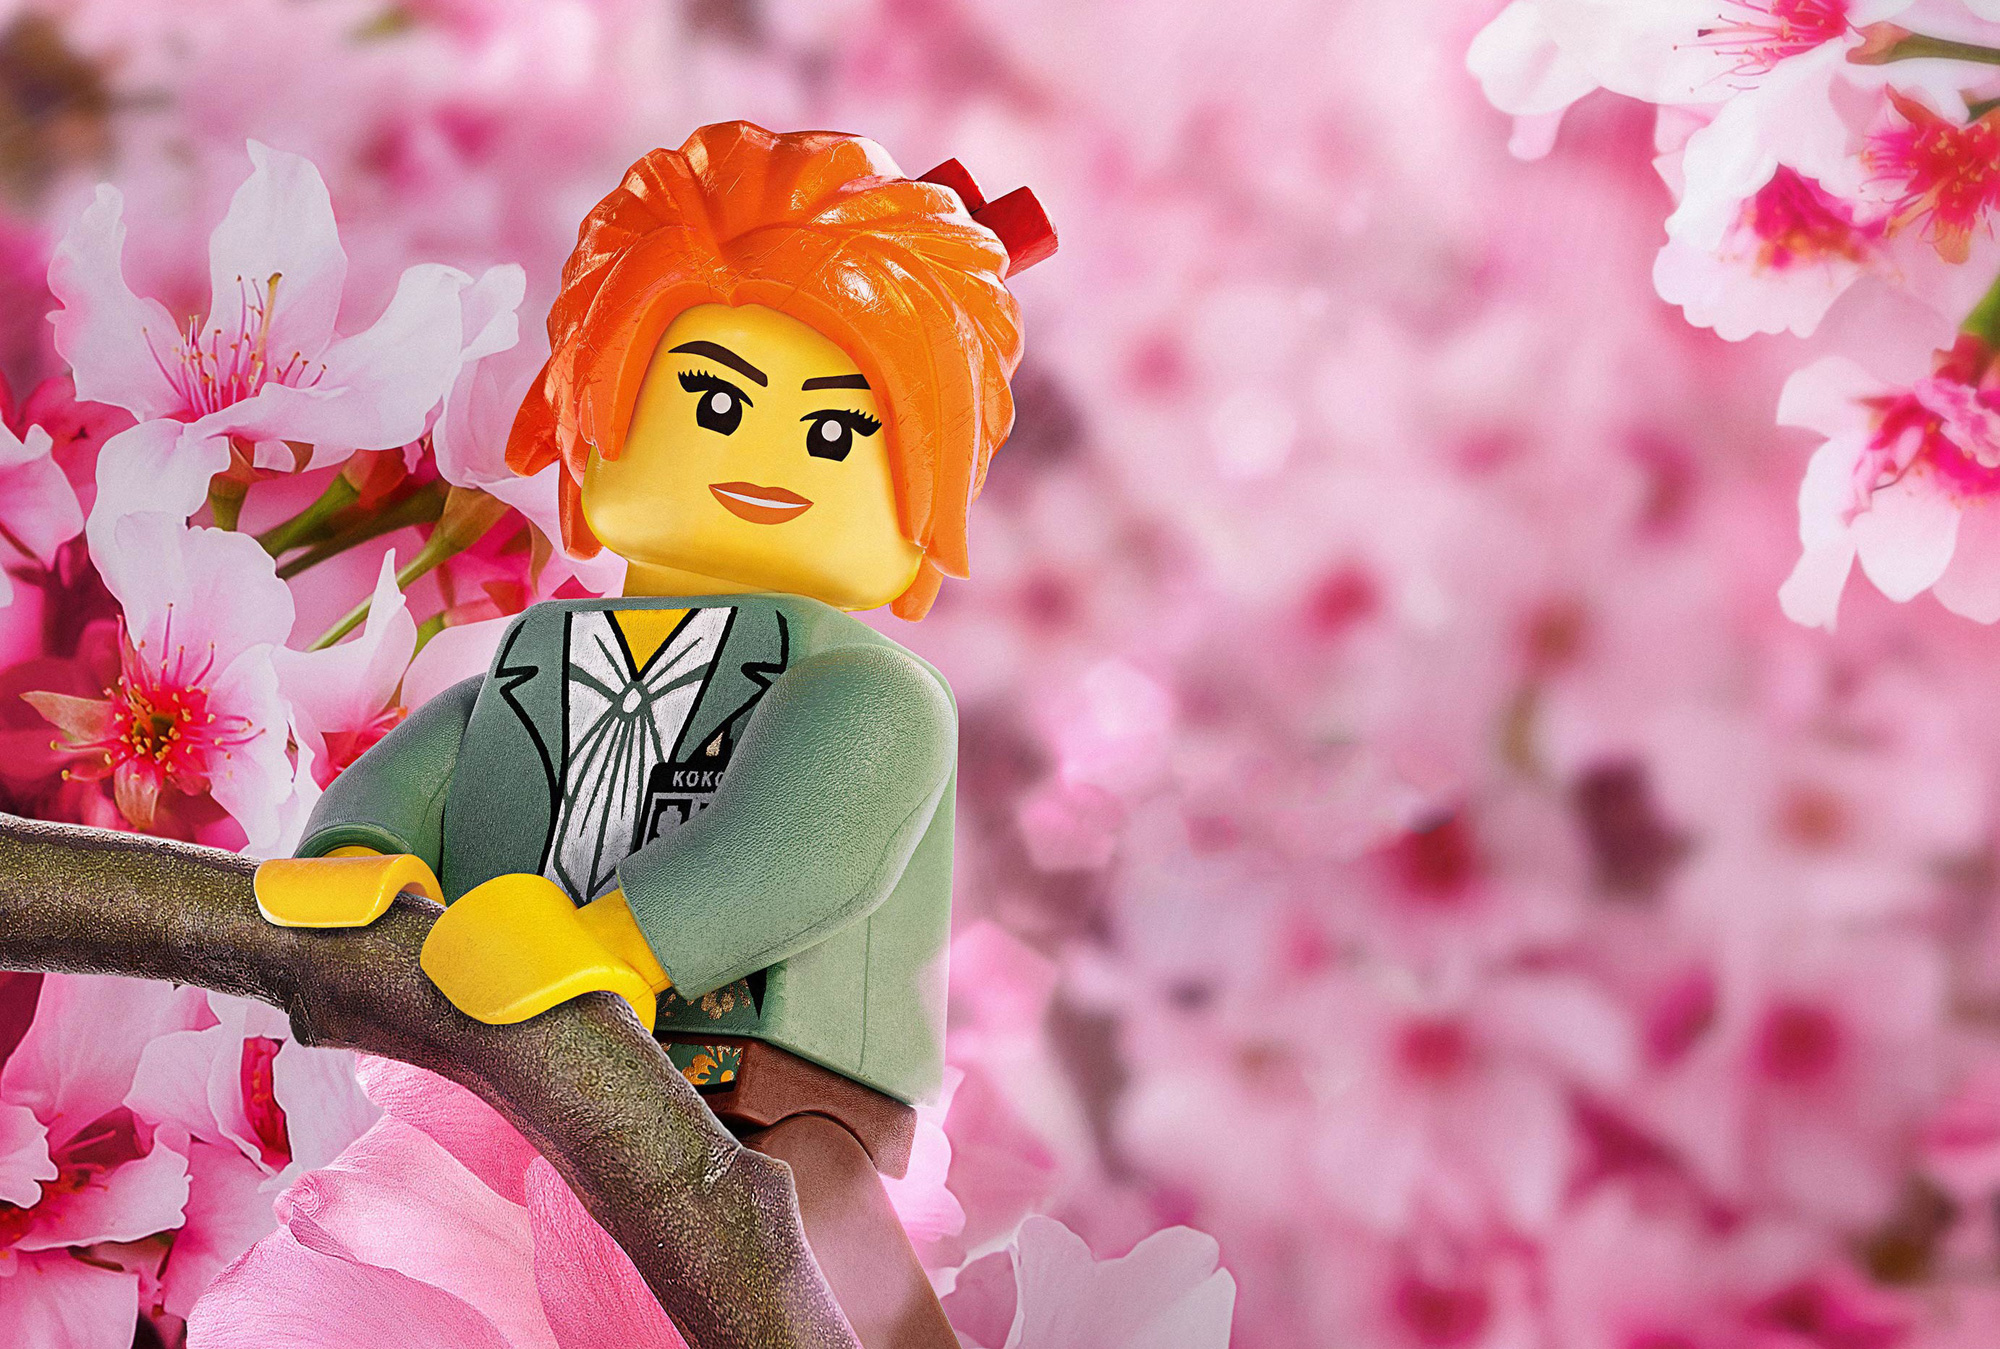 Fondos De Pantalla De Quikis: Fondos De Pantalla La Lego Ninjago, Wallpapers HD